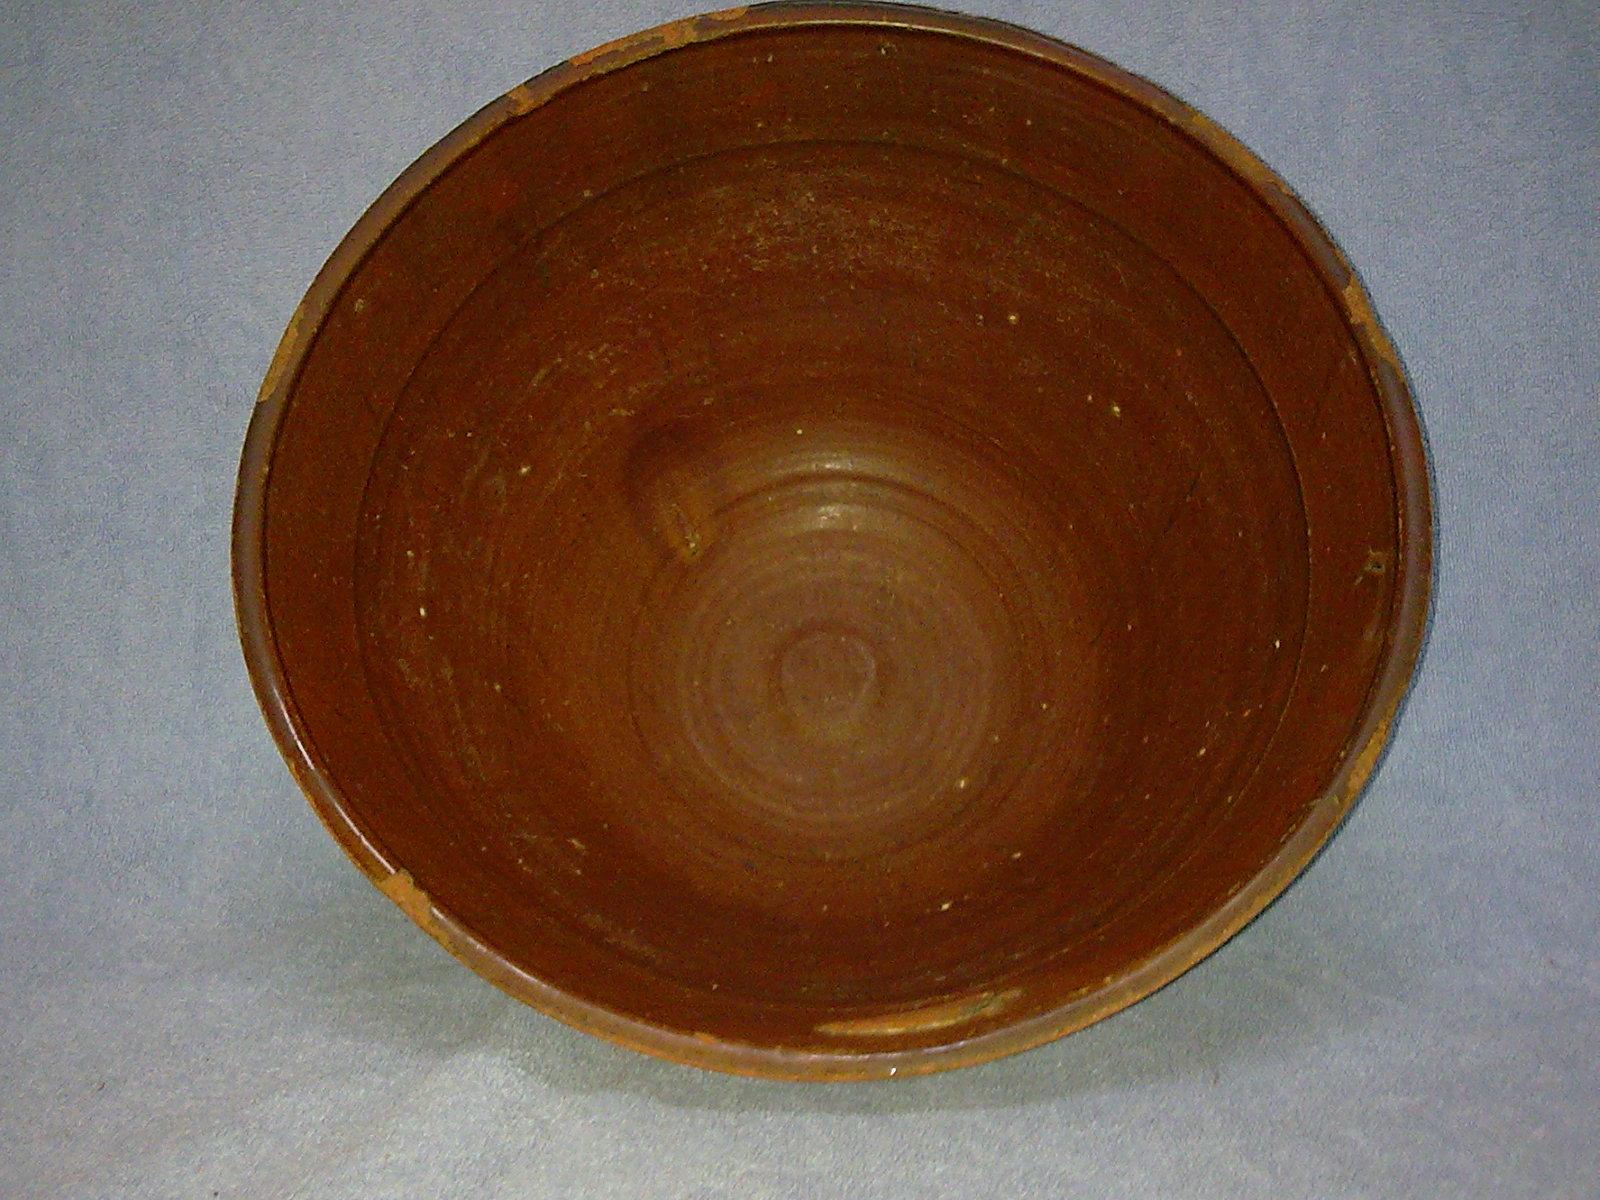 Antiguedades cazuela de barro antigua - Cazuelas de cobre ...